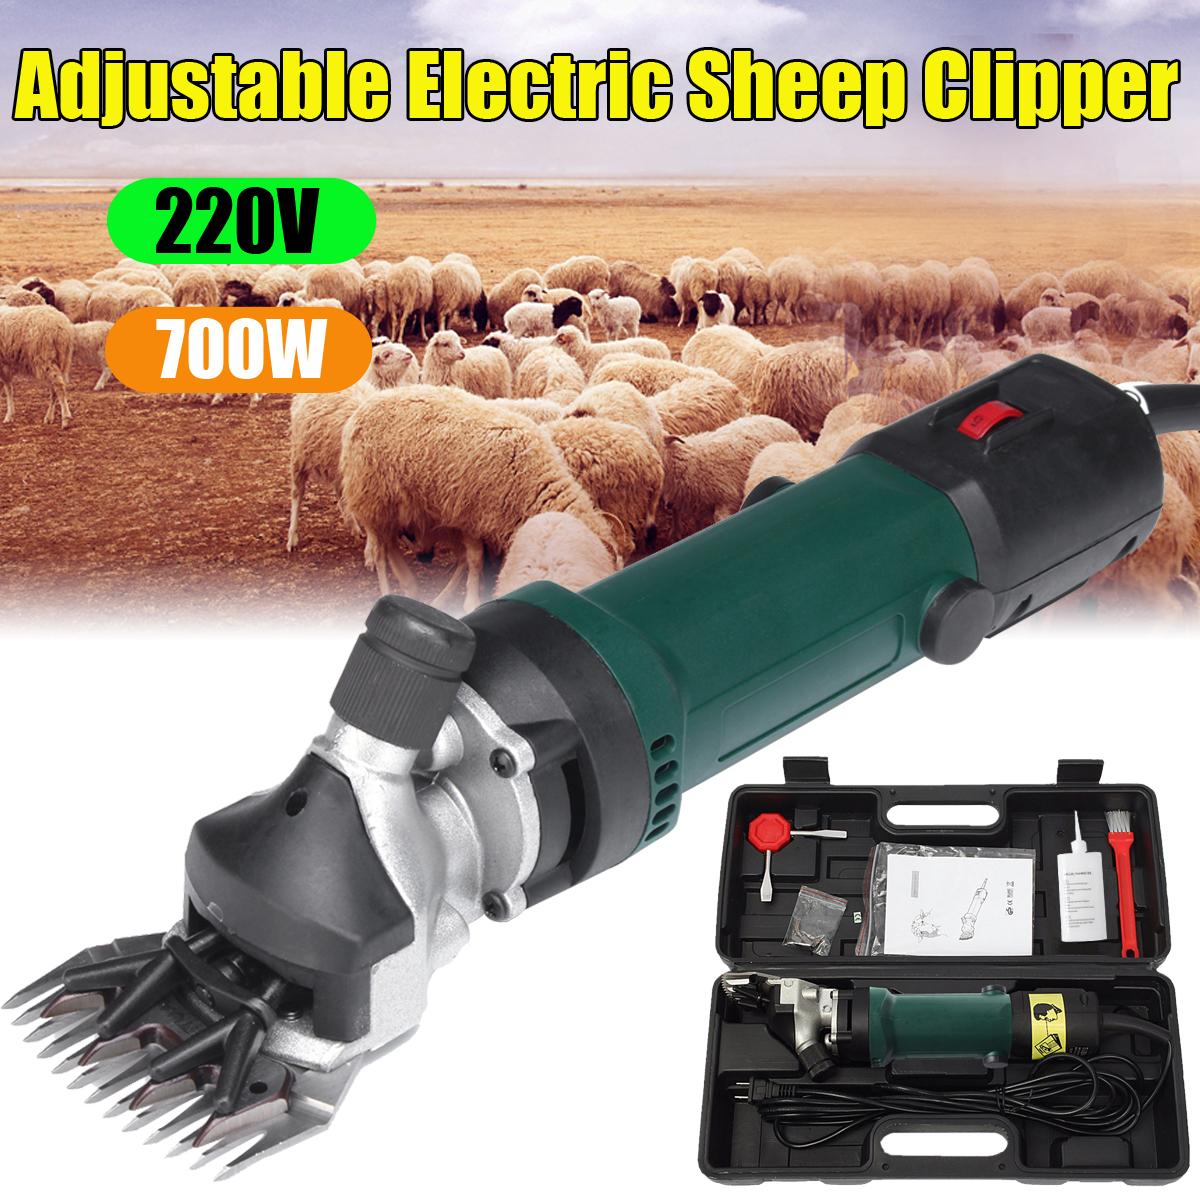 220V Electric Shear Shearing Clipper Animal Sheep Goat Pet Farm Machine On Sale